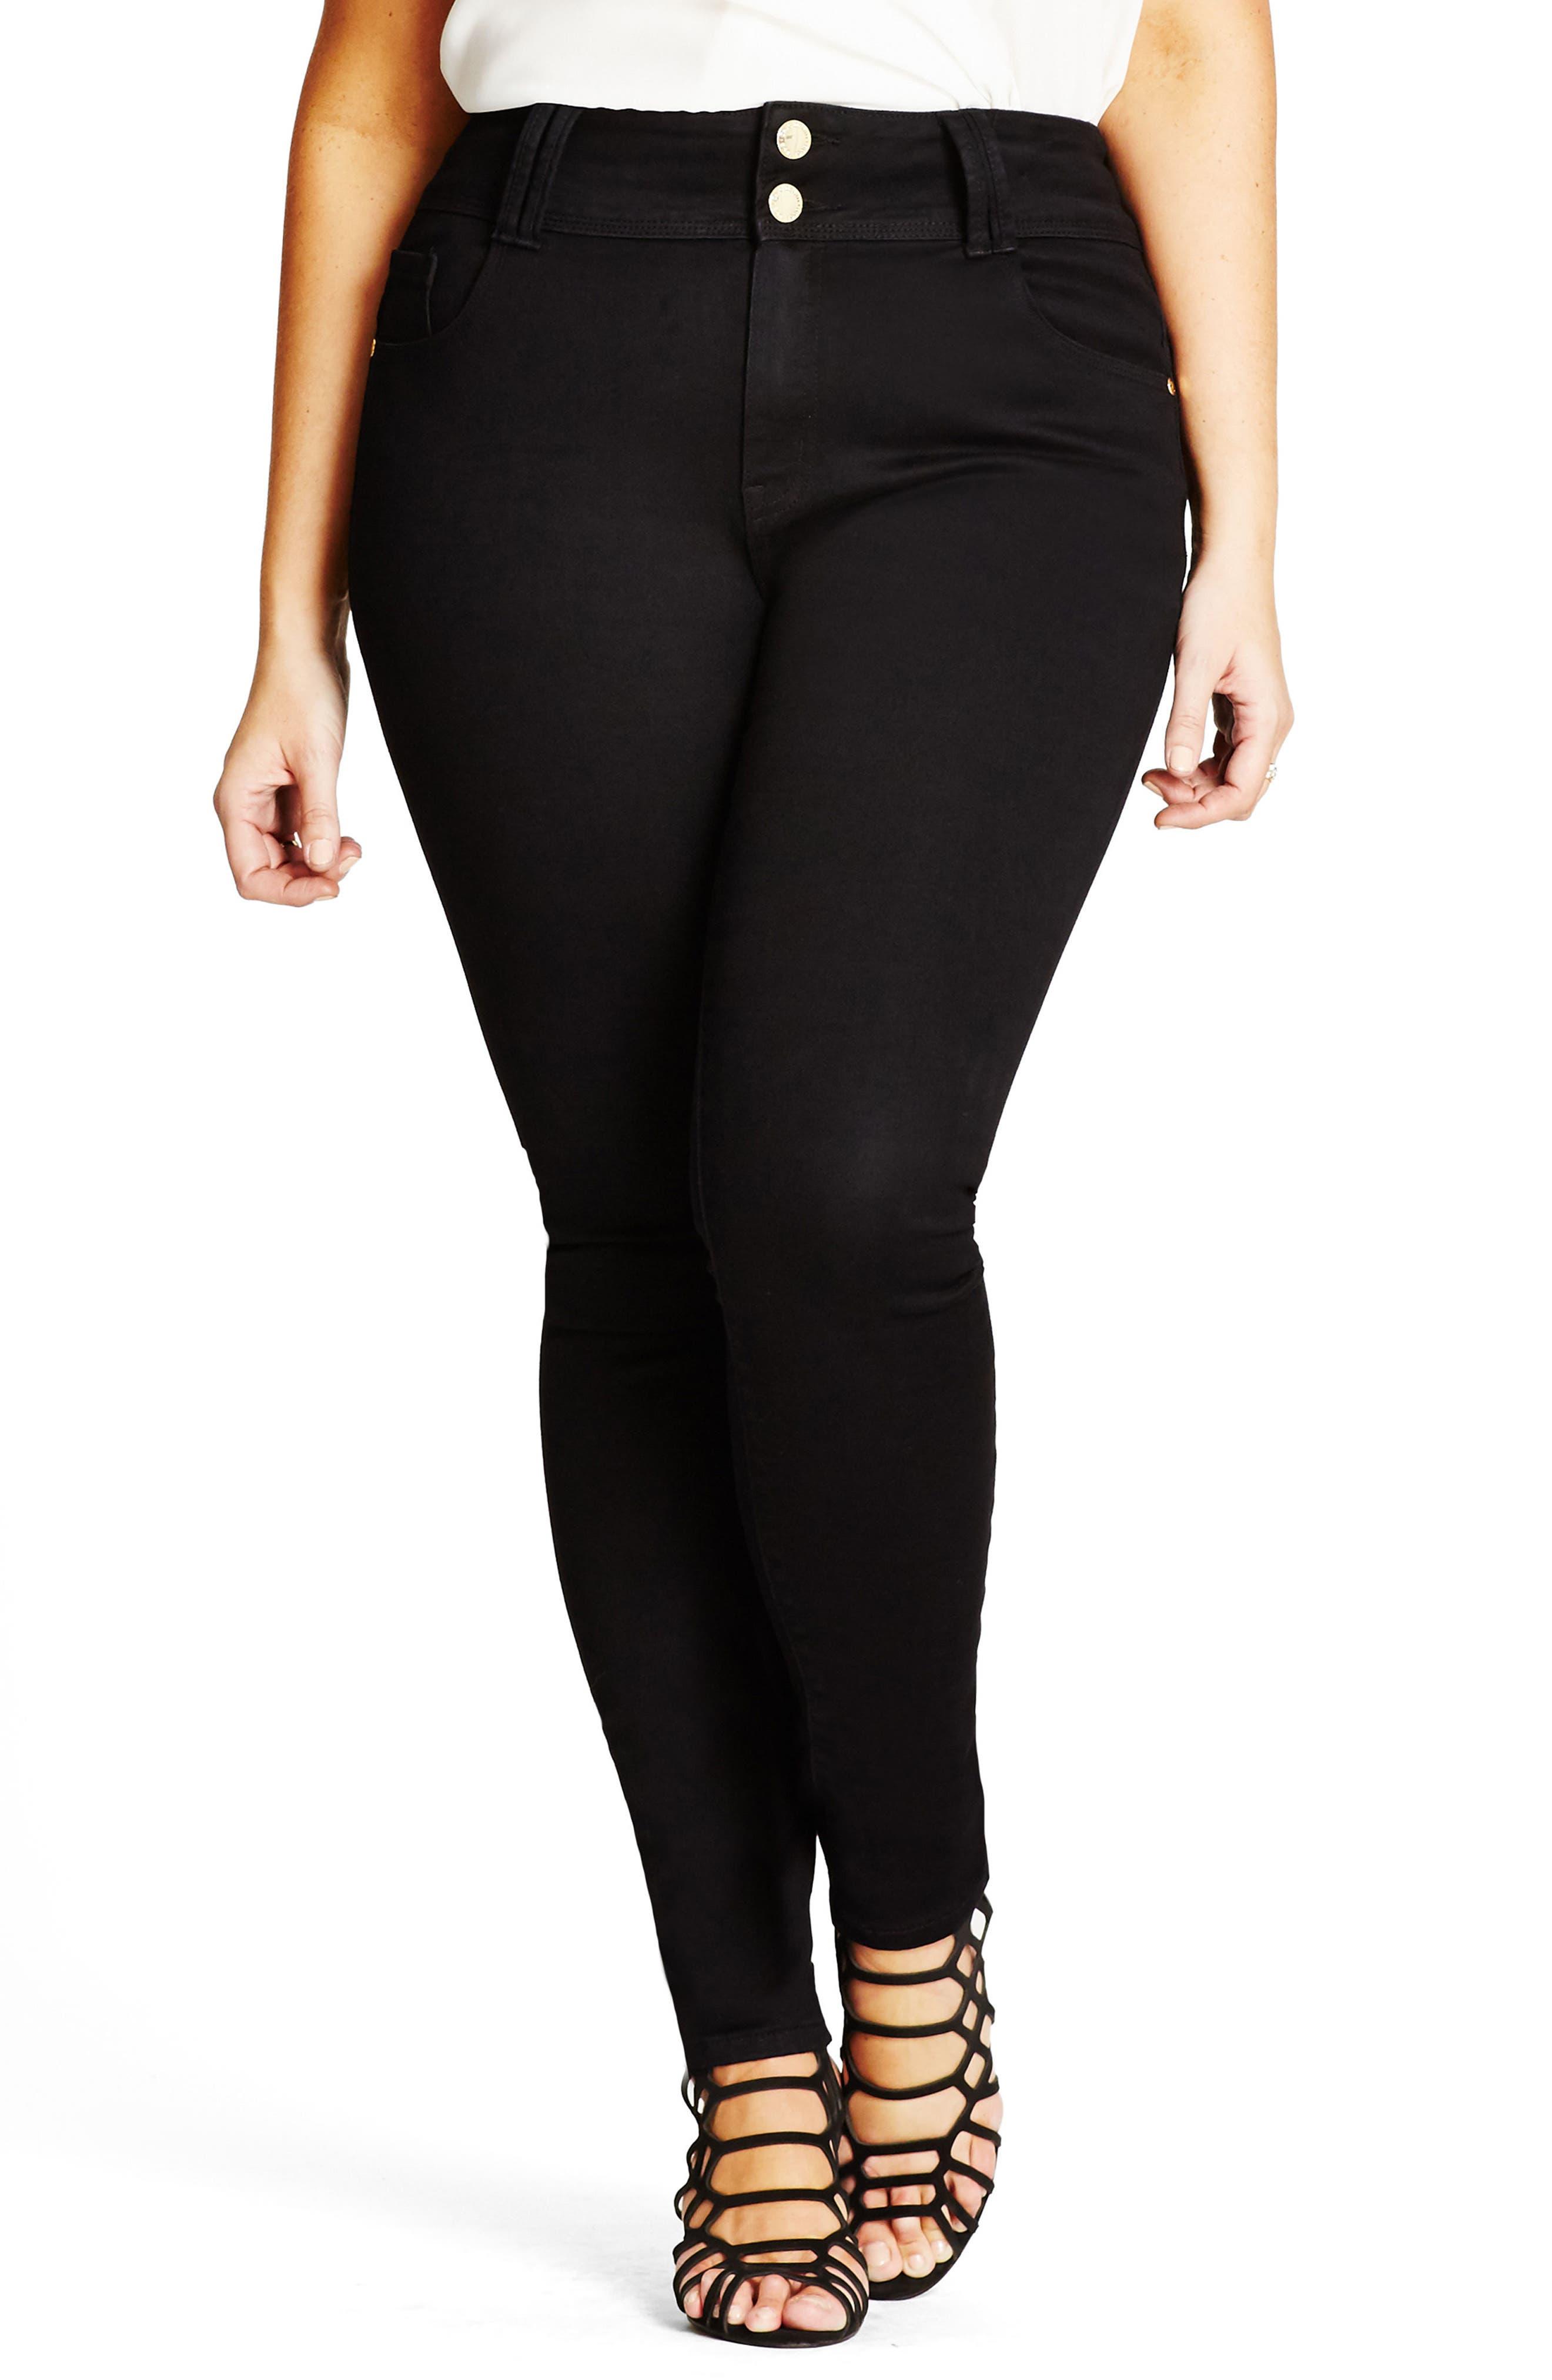 Main Image - City Chic Asha High Waisted Skinny Jeans (Plus Size)